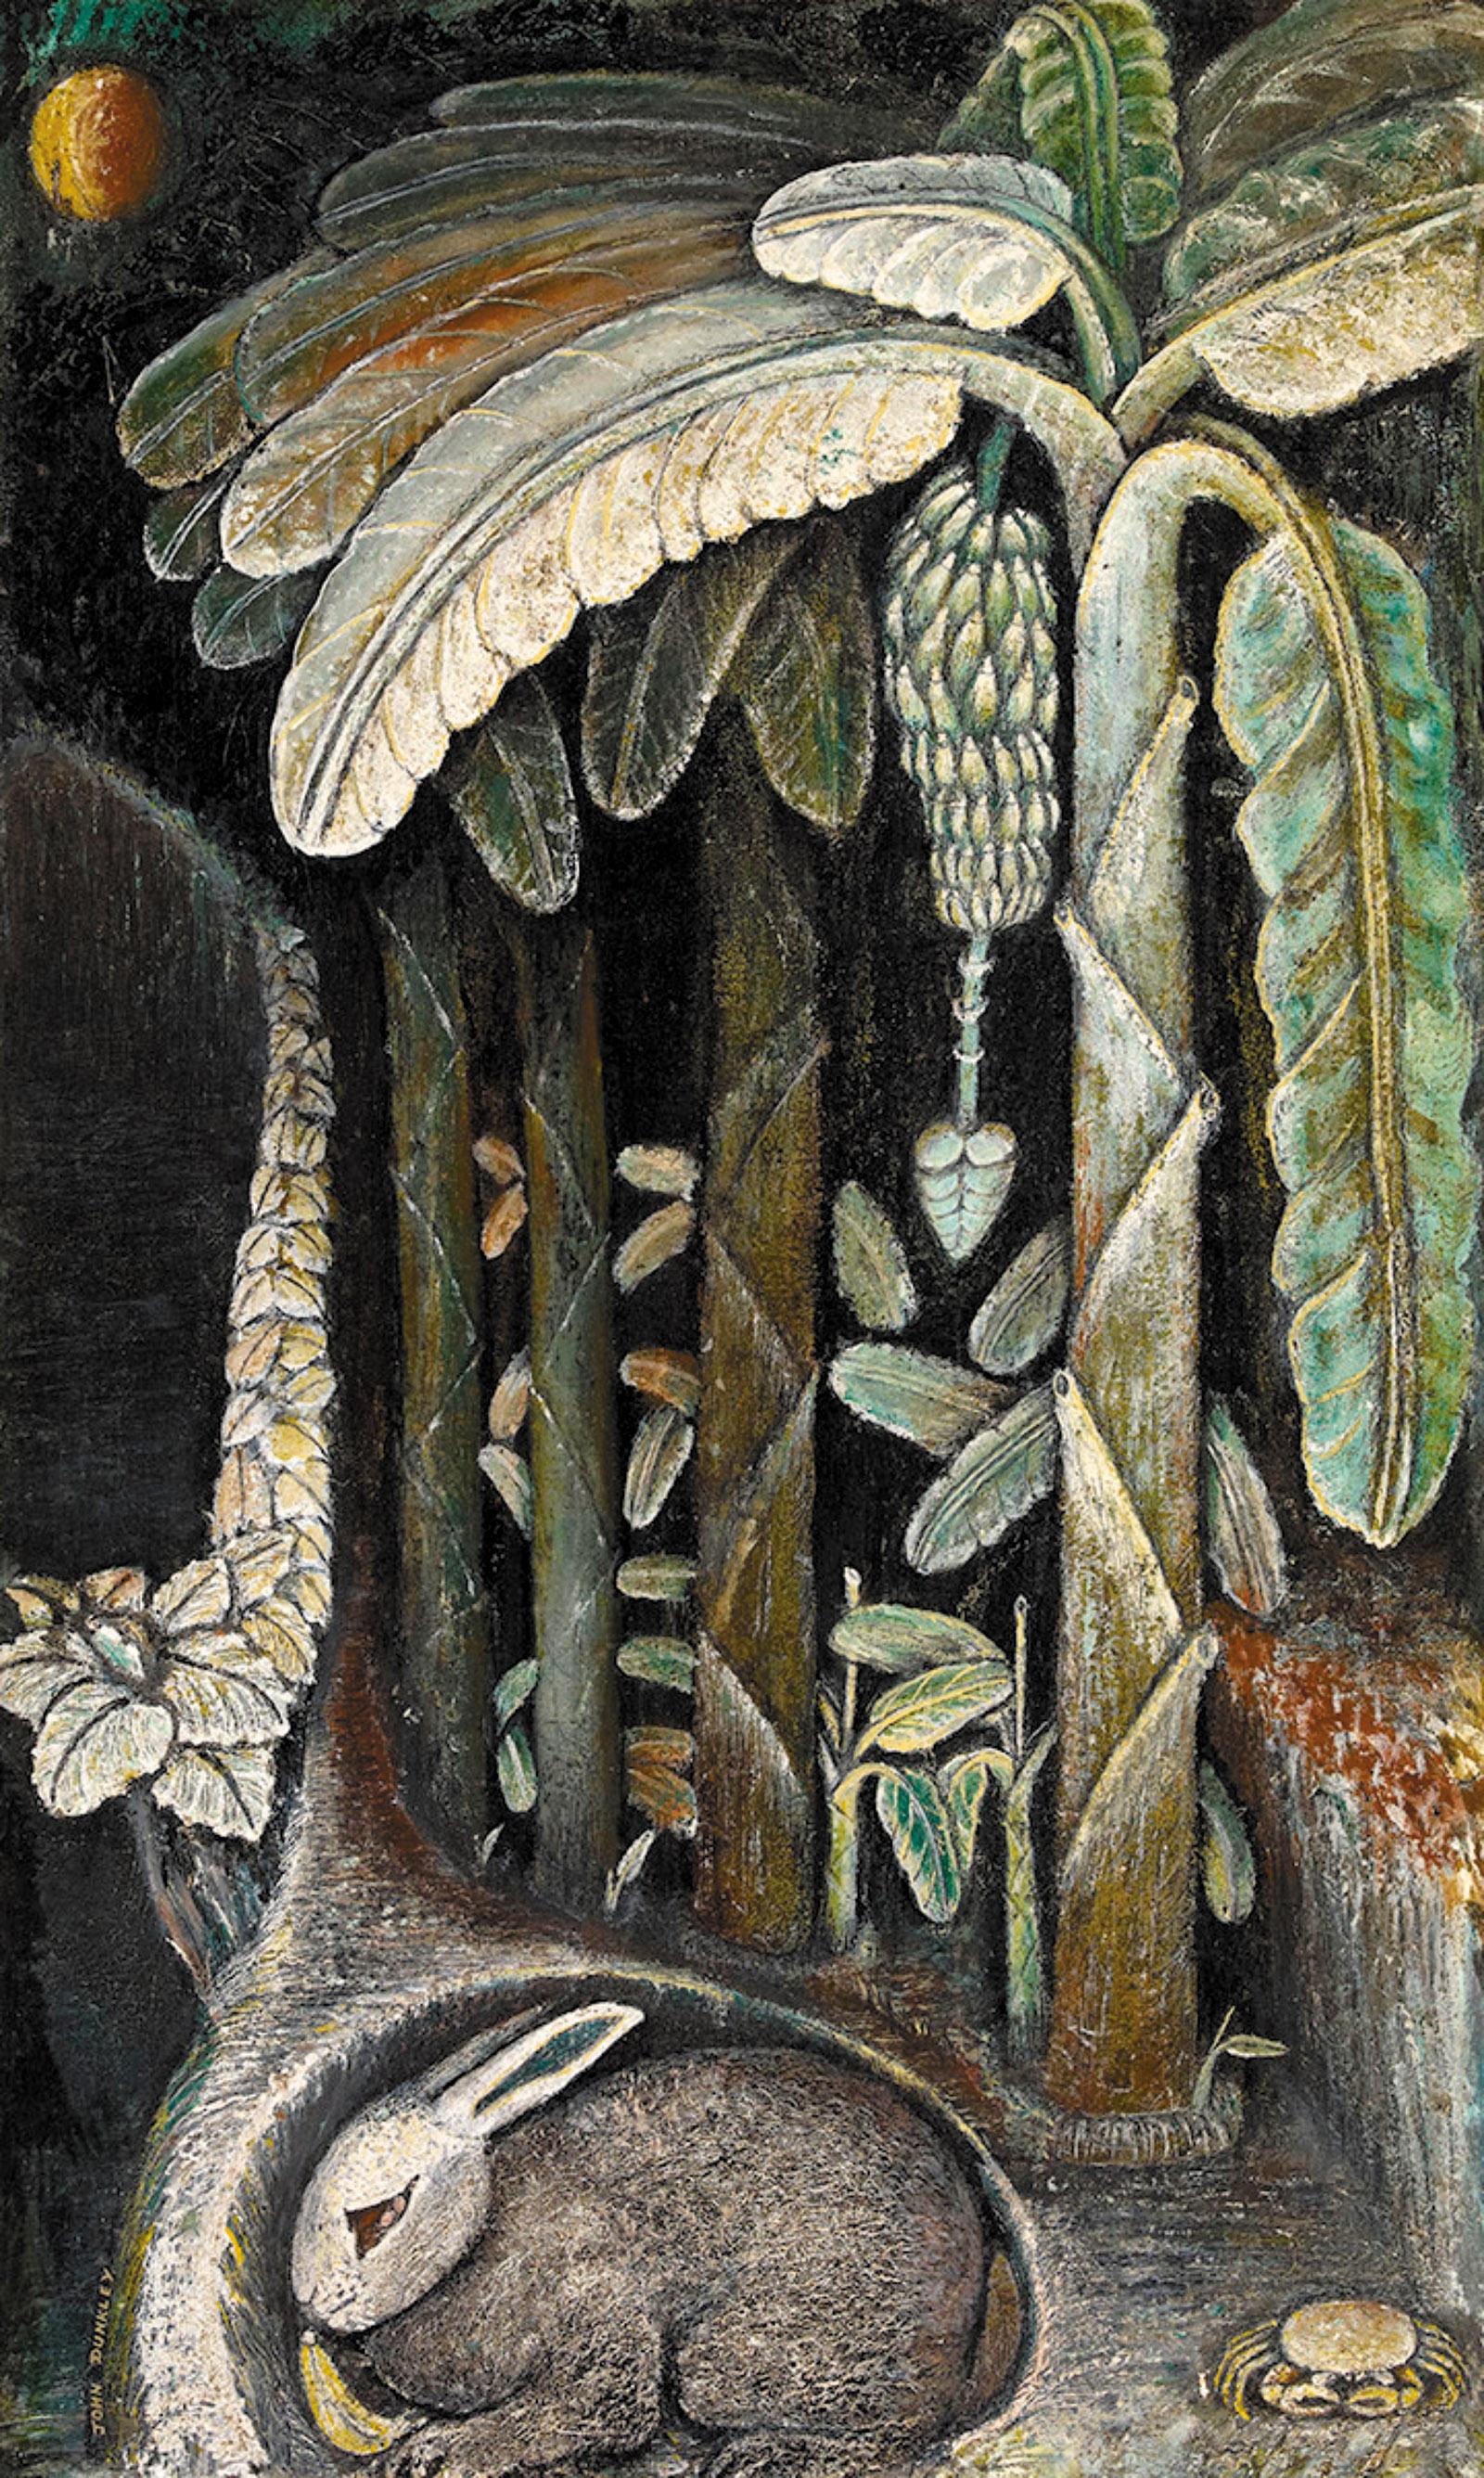 John Dunkley: Banana Plantation, 29 1/8 x 17 5/8 inches, circa 1945